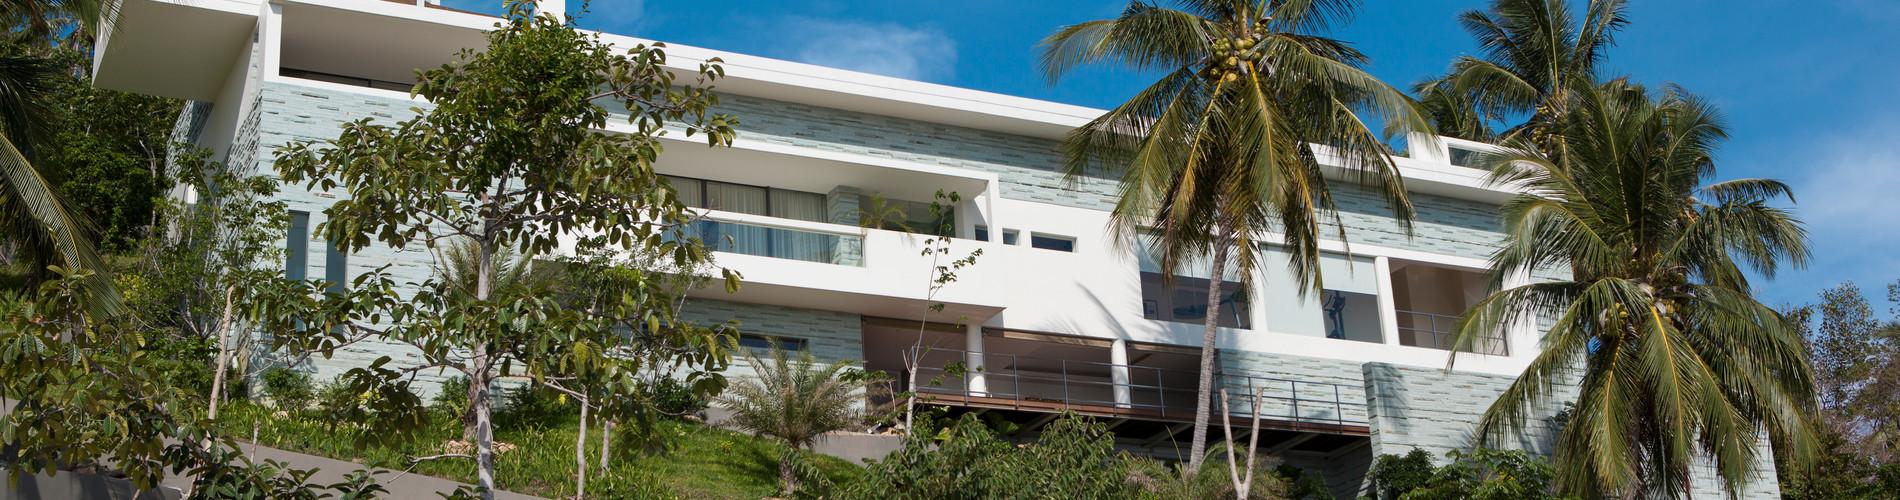 Vacation Rental Villa Splash At Lime Samui